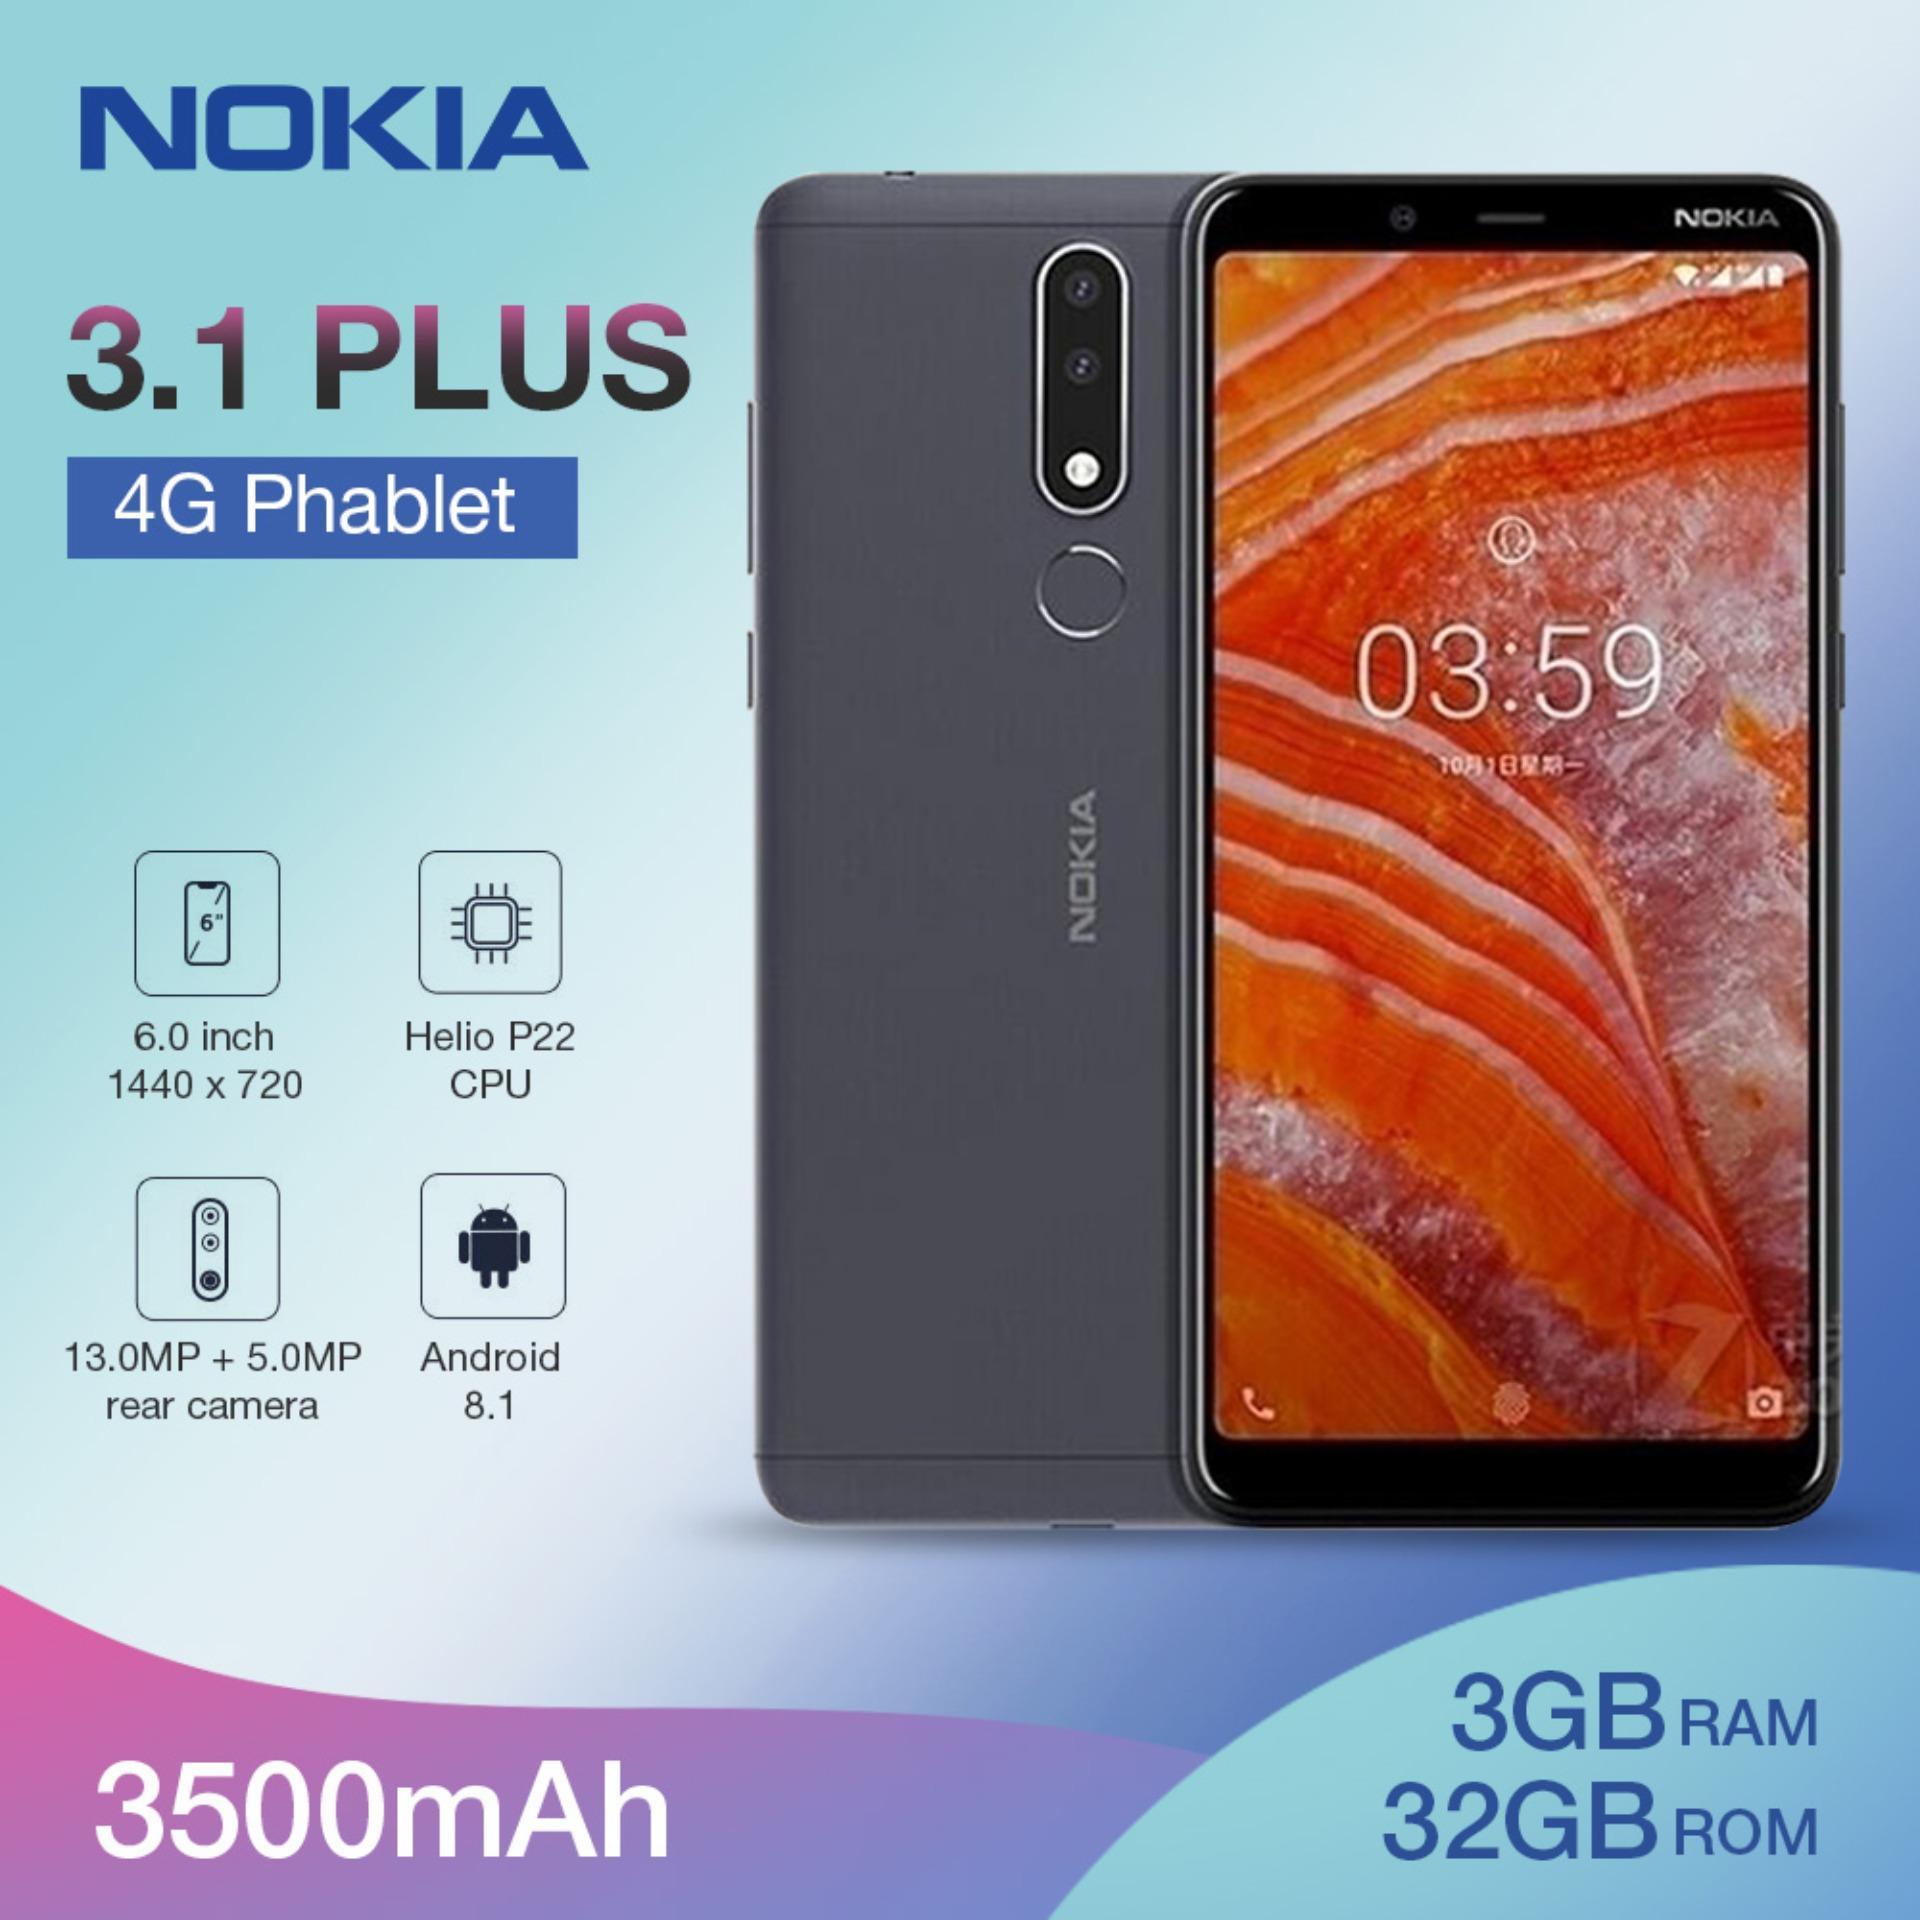 Original Nokia 3 1 Plus 4G Phablet 6 0 inch Android 8 1 MTK 6762 ( Helio  P22 ) Octa Core 2 0GHz 3GB RAM 32GB ROM 13 0MP + 5 0MP Rear Camera